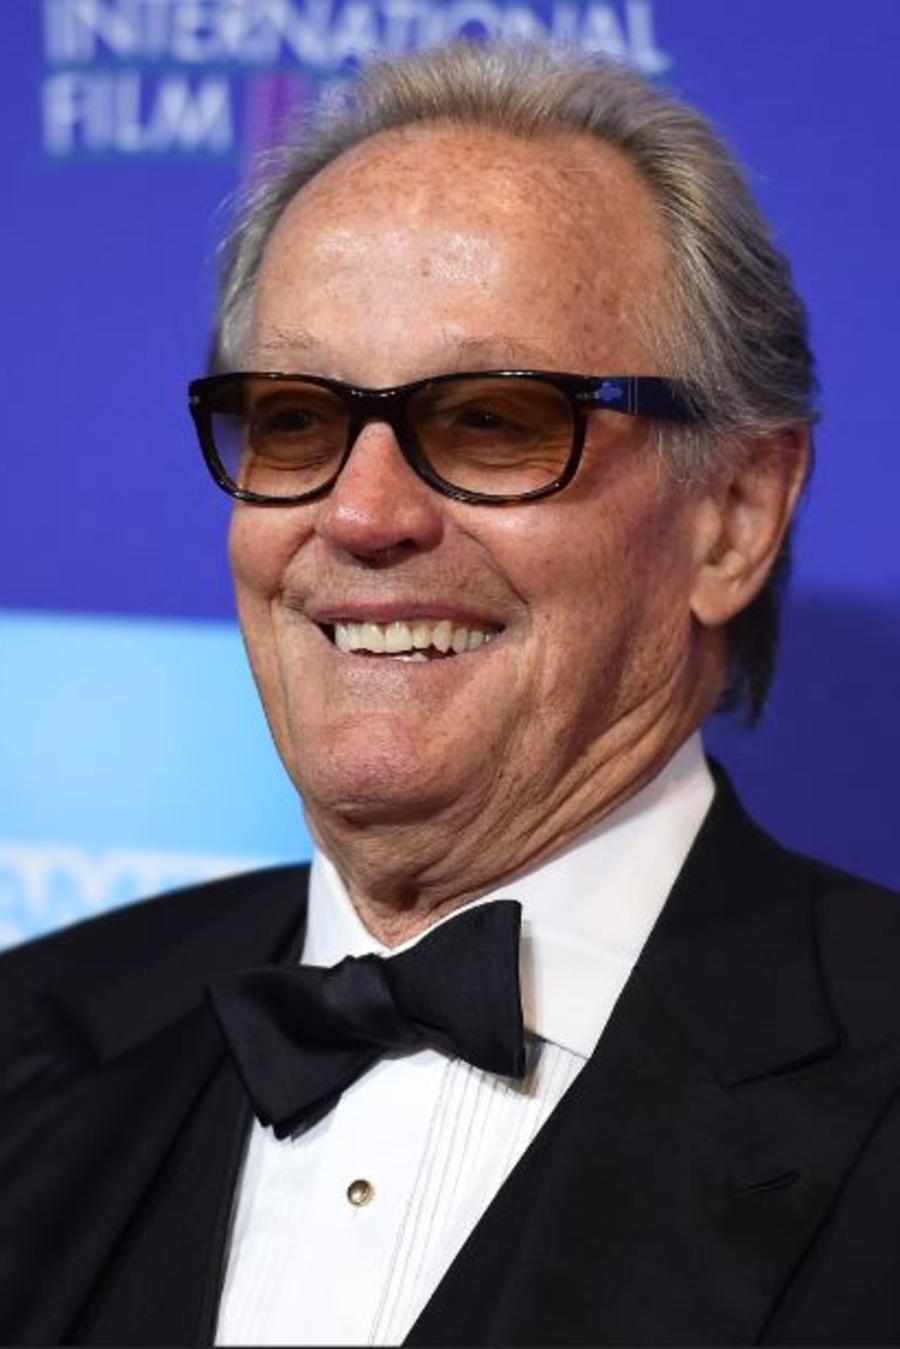 Peter Fonda en una imagen de archivo.